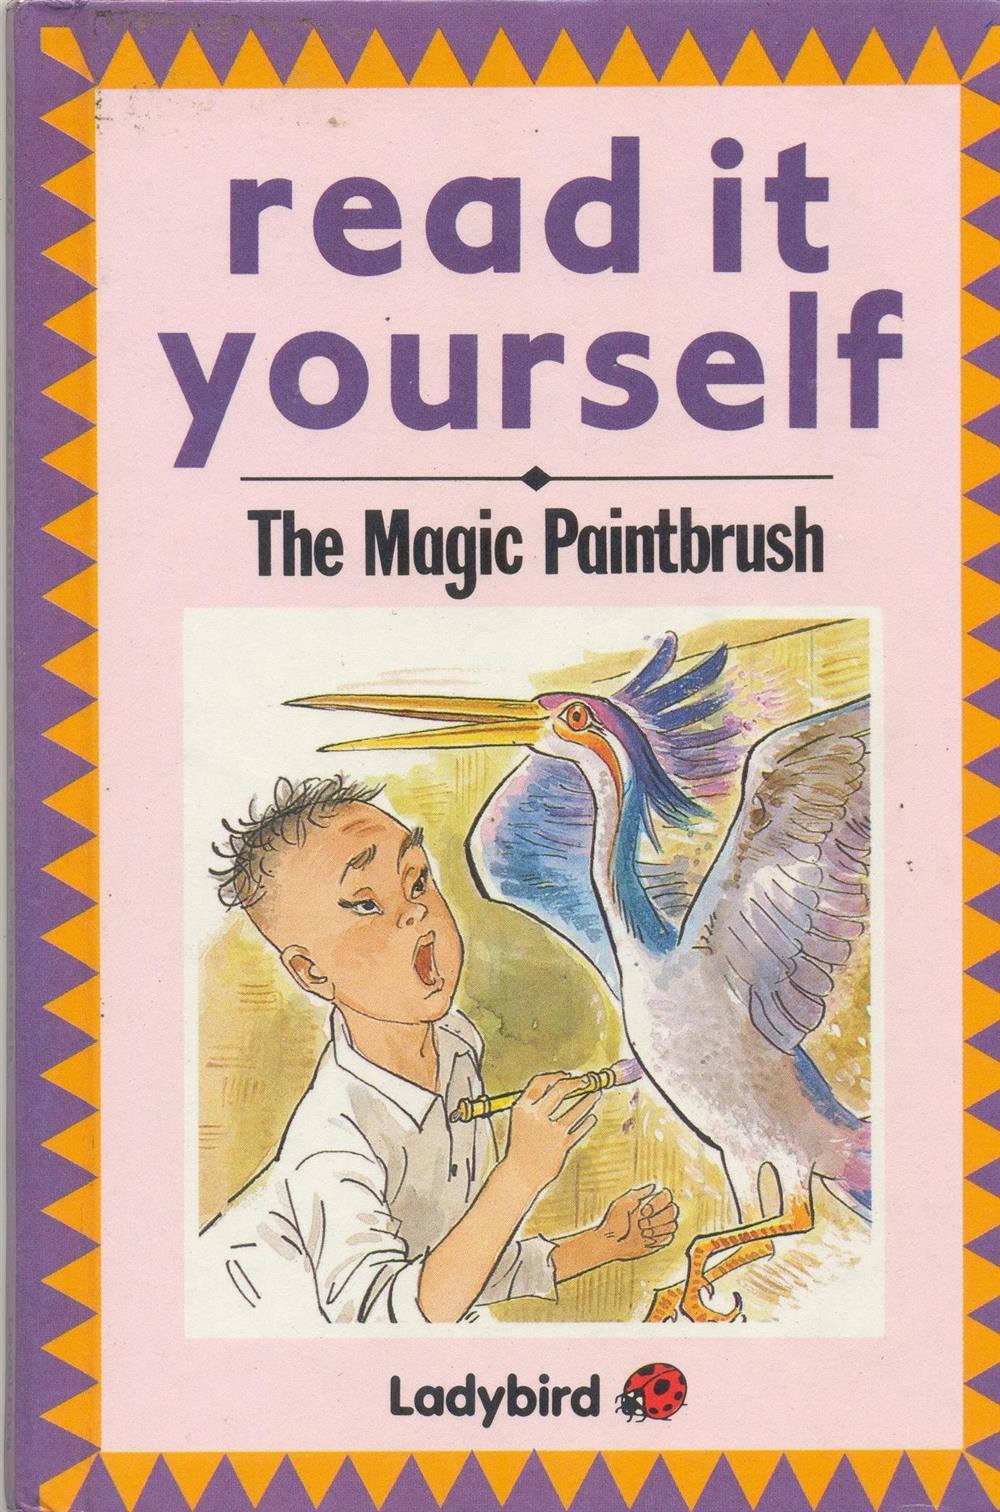 The magic Paintbrush 001.jpg